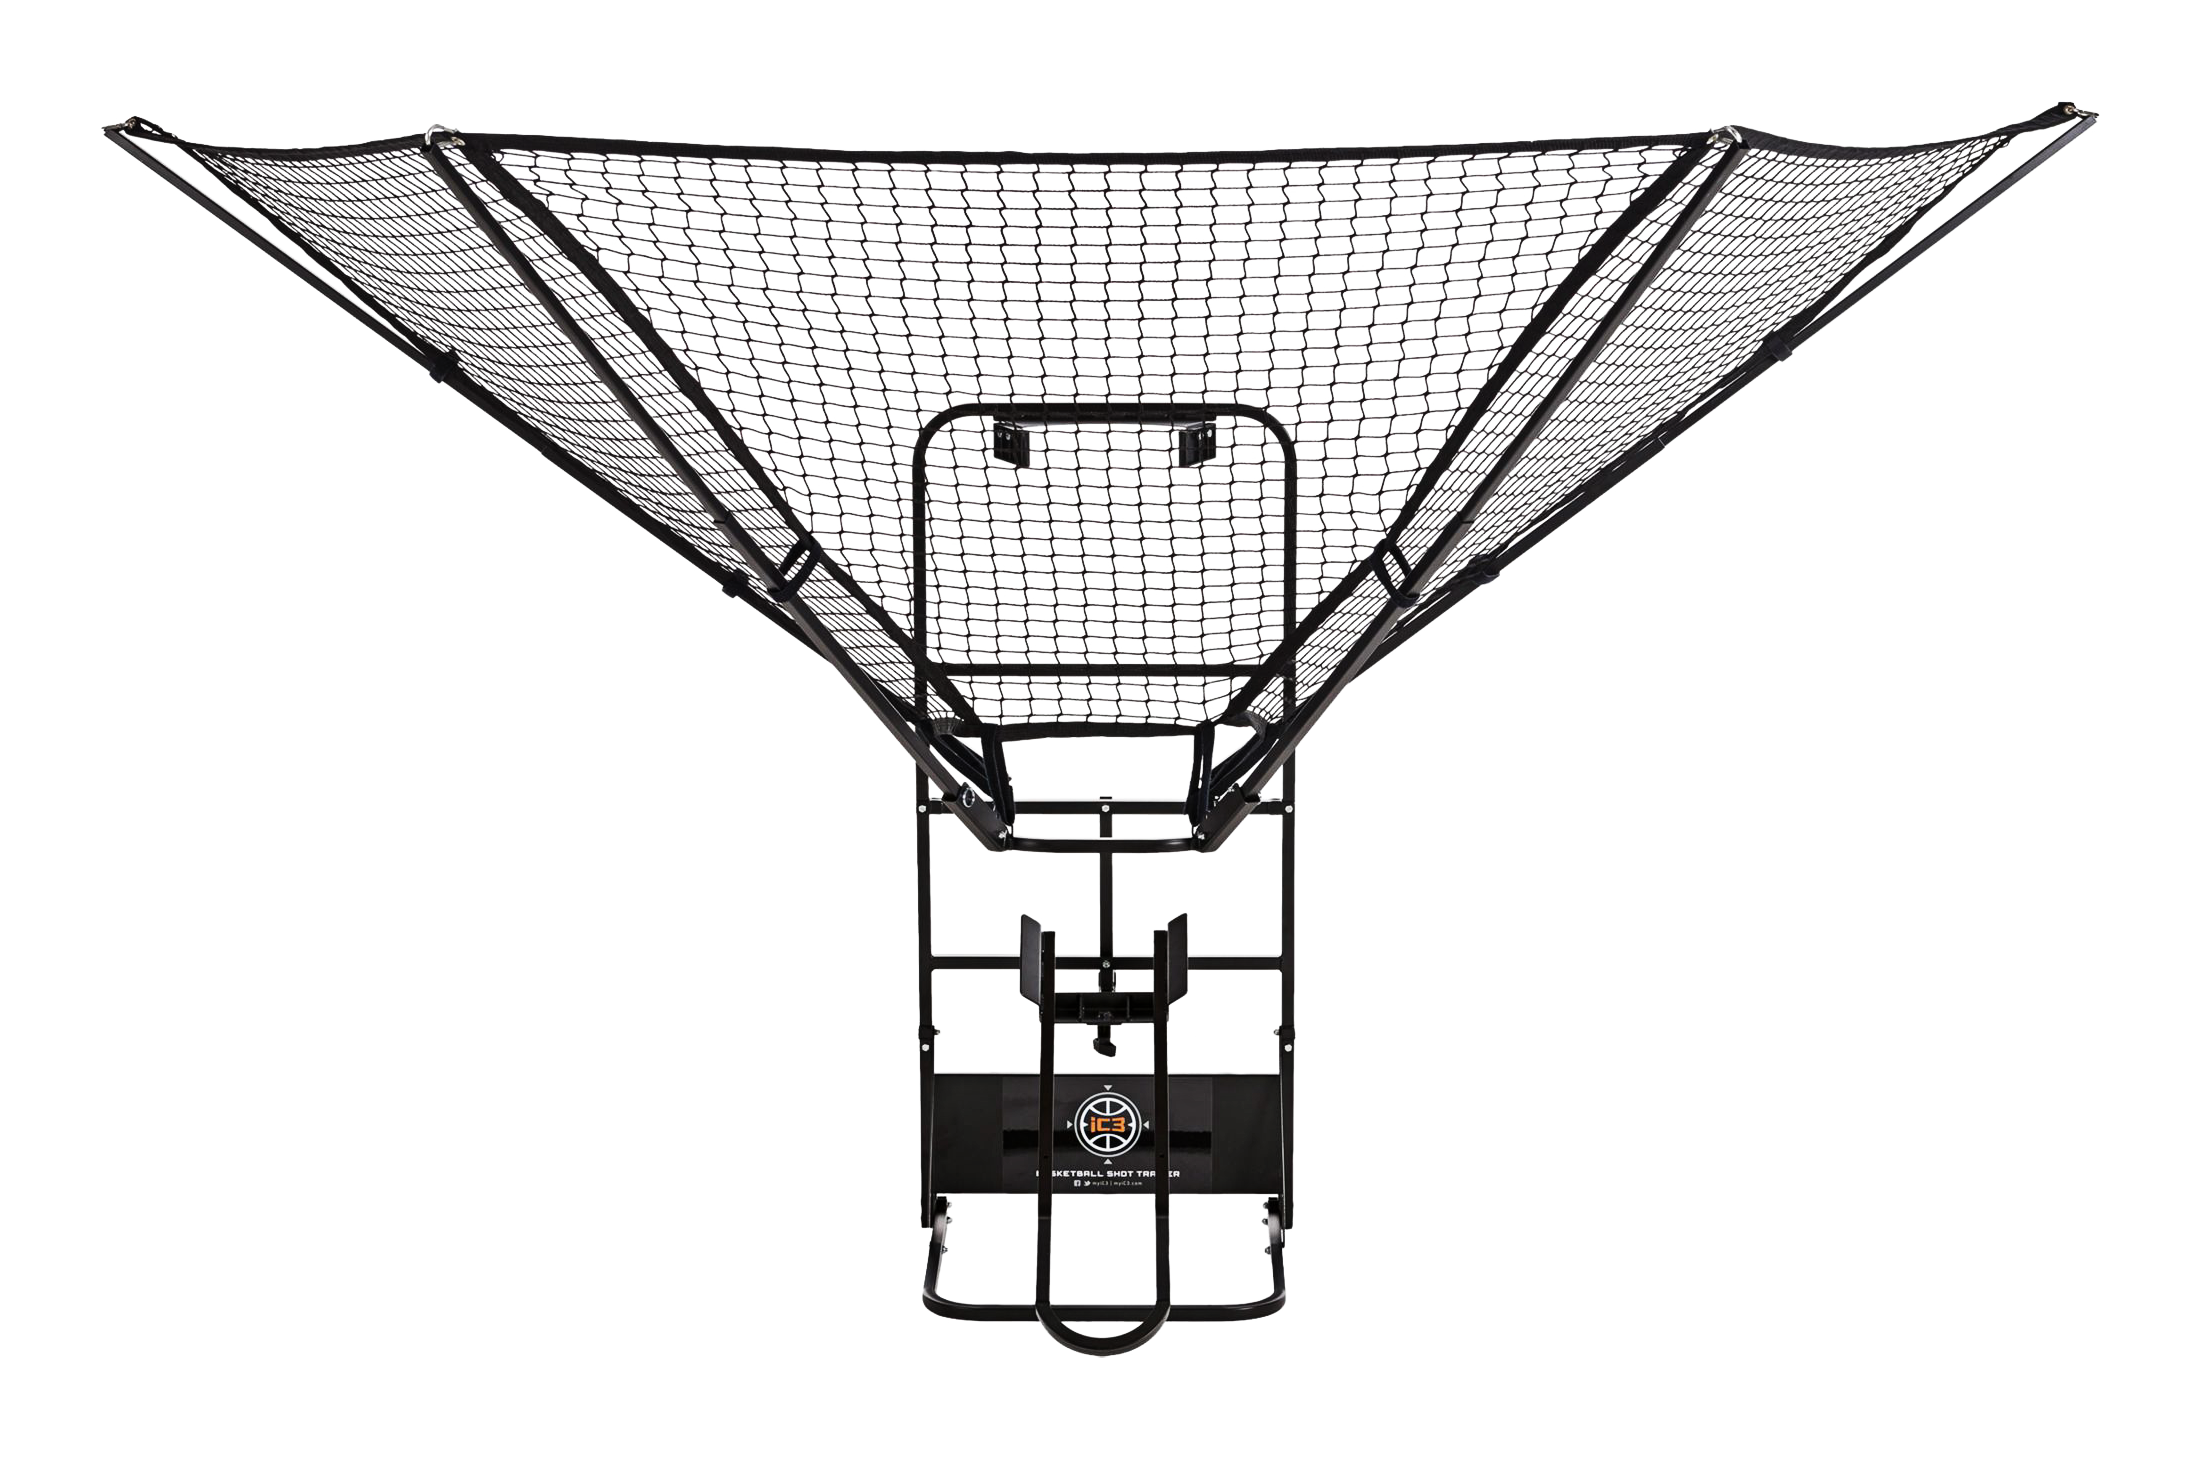 ic3-front-cutout-1